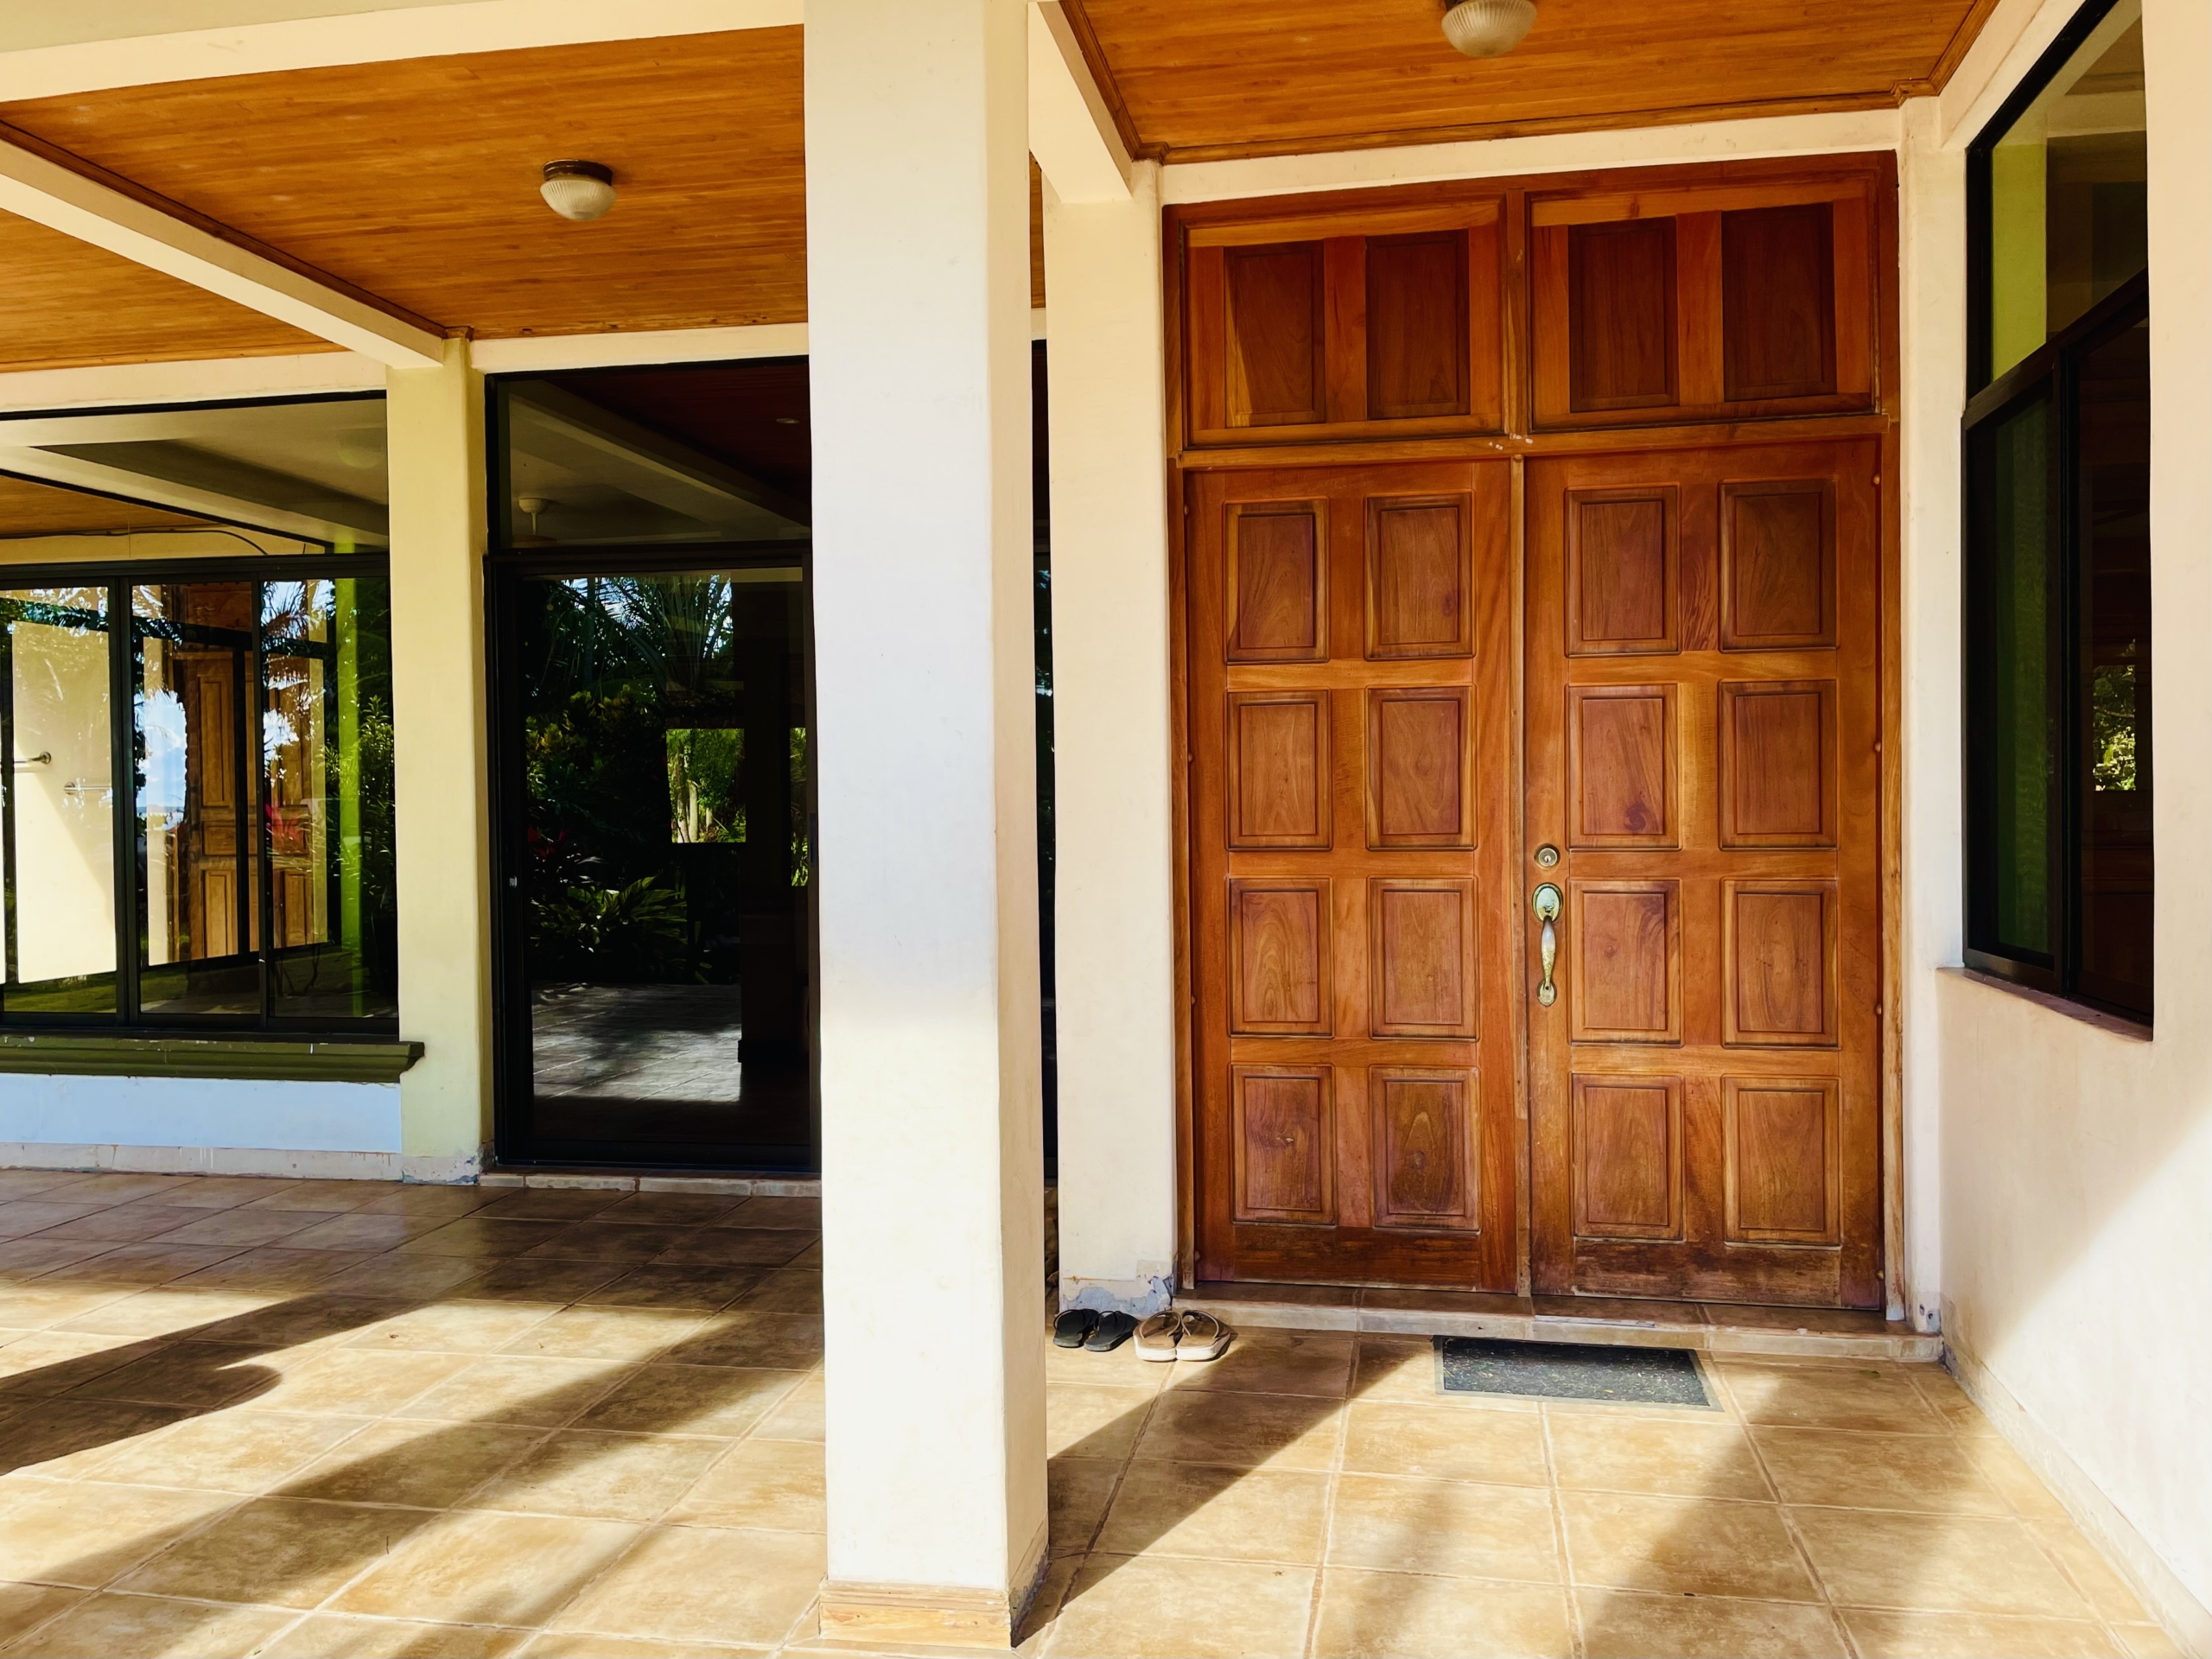 boca-barranca-costa-rica-villa-front-door